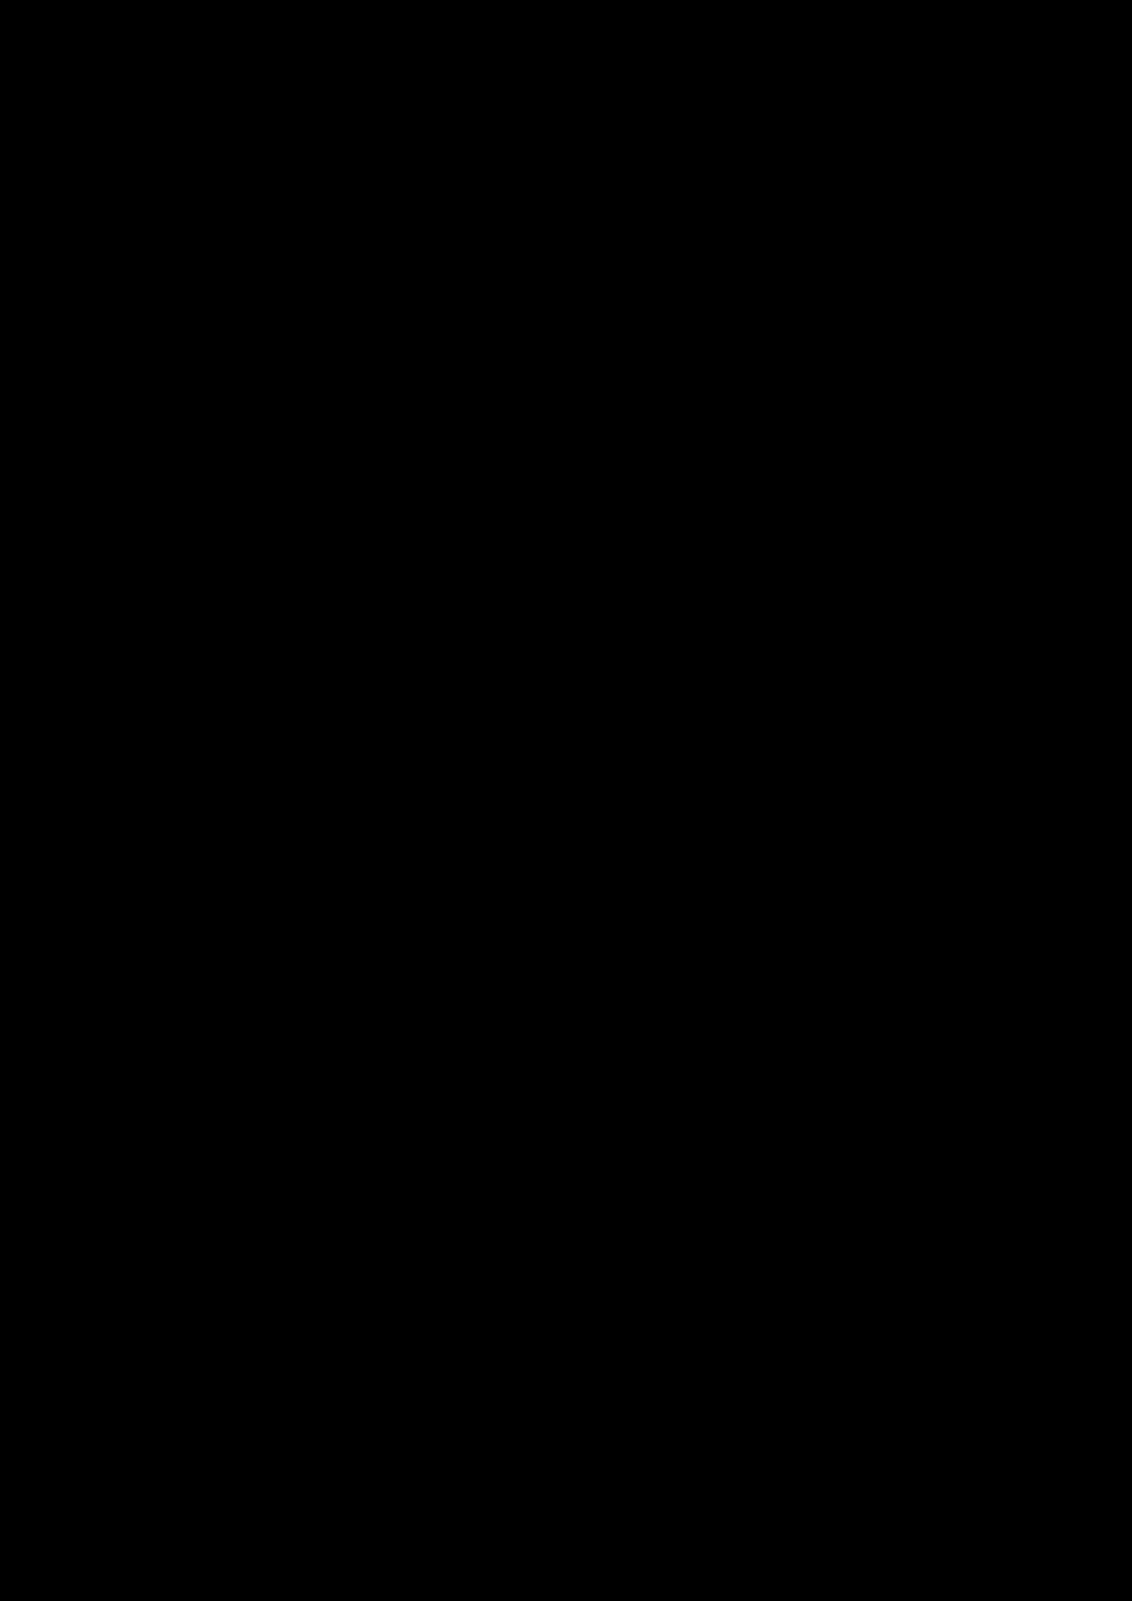 Belyiy sokol slide, Image 172